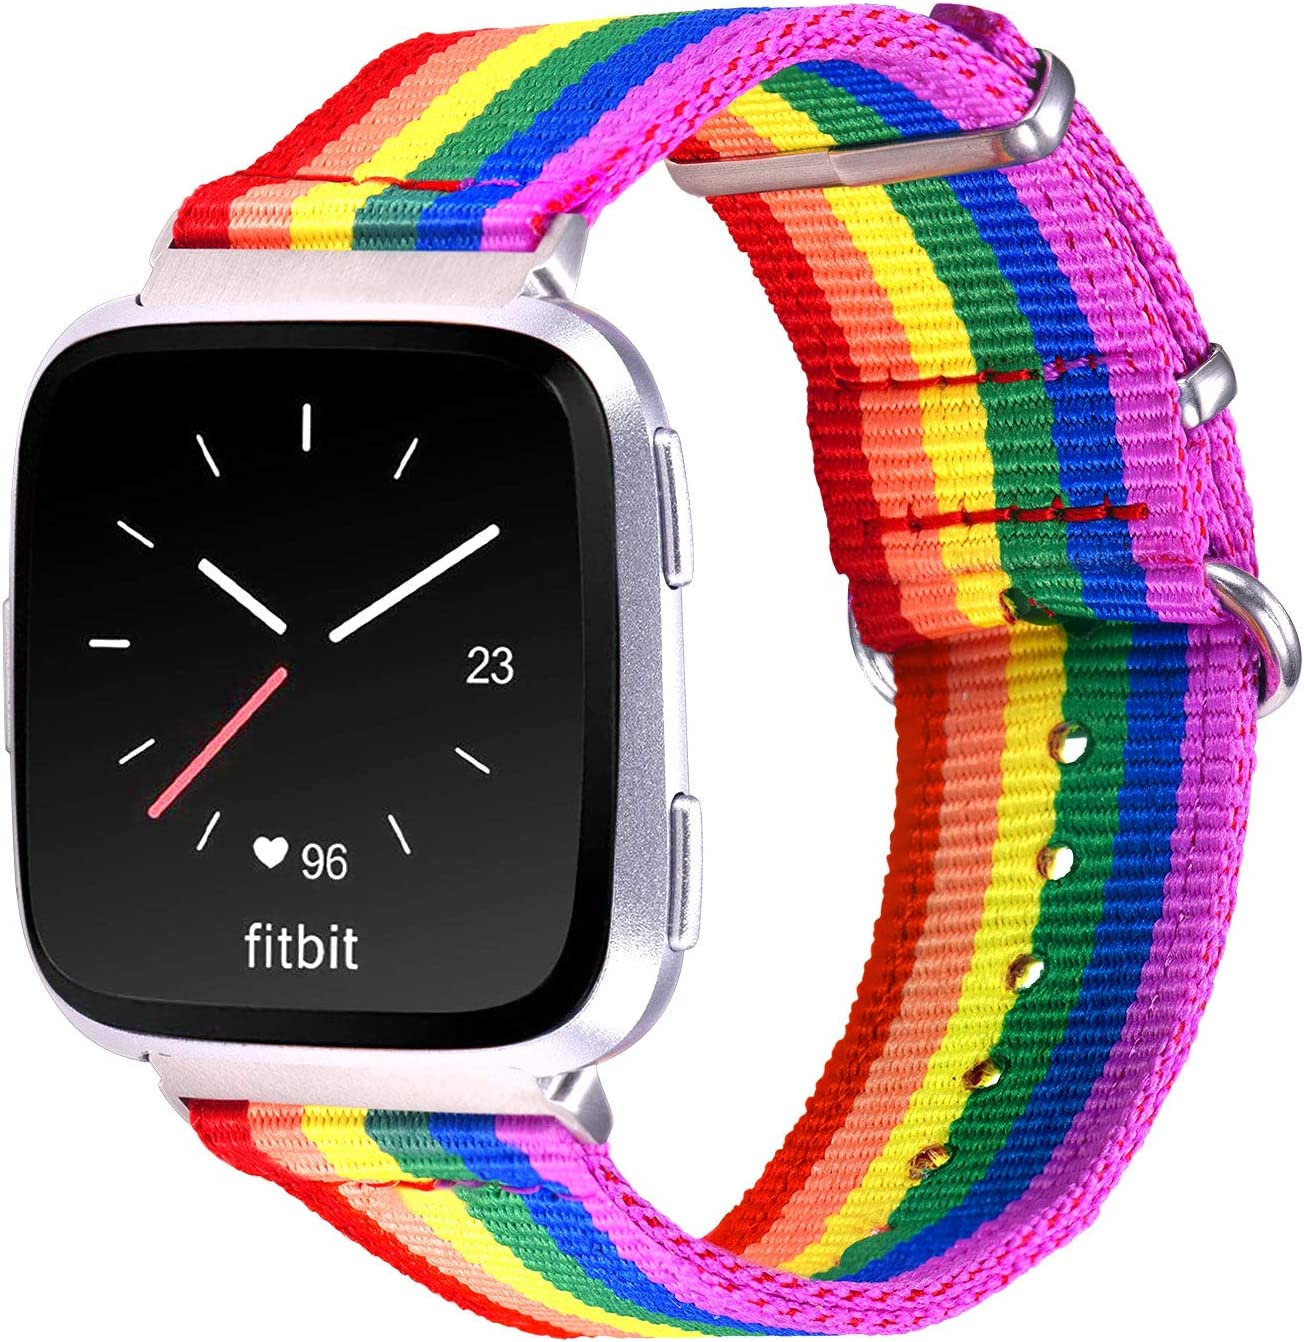 LGBT Scrunchie Gay Pride Scrunchie Pride Month Accessory Rainbow Scrunchie